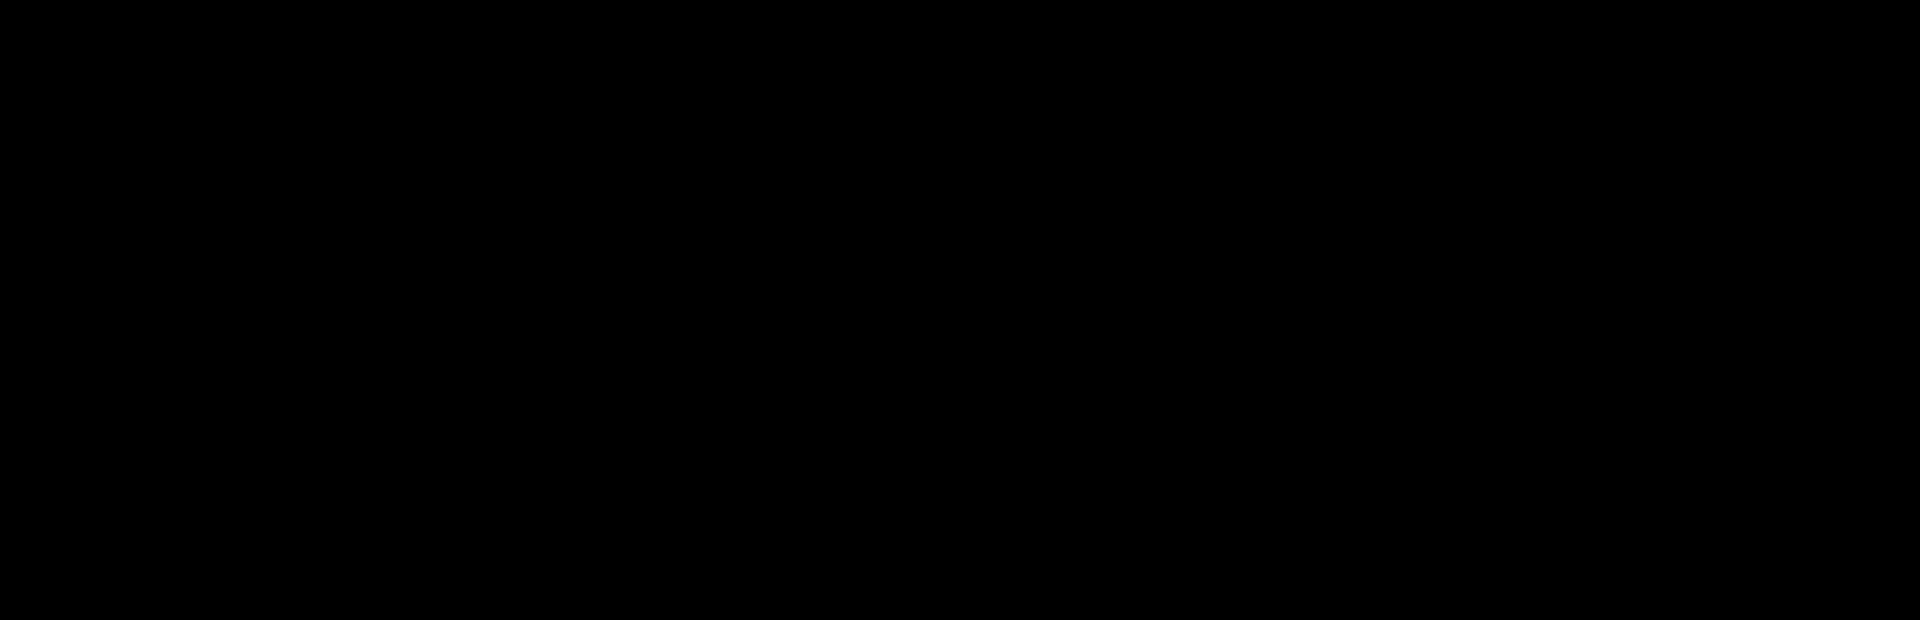 Flourish clipart svg. File wikimedia commons fileflourishsvg